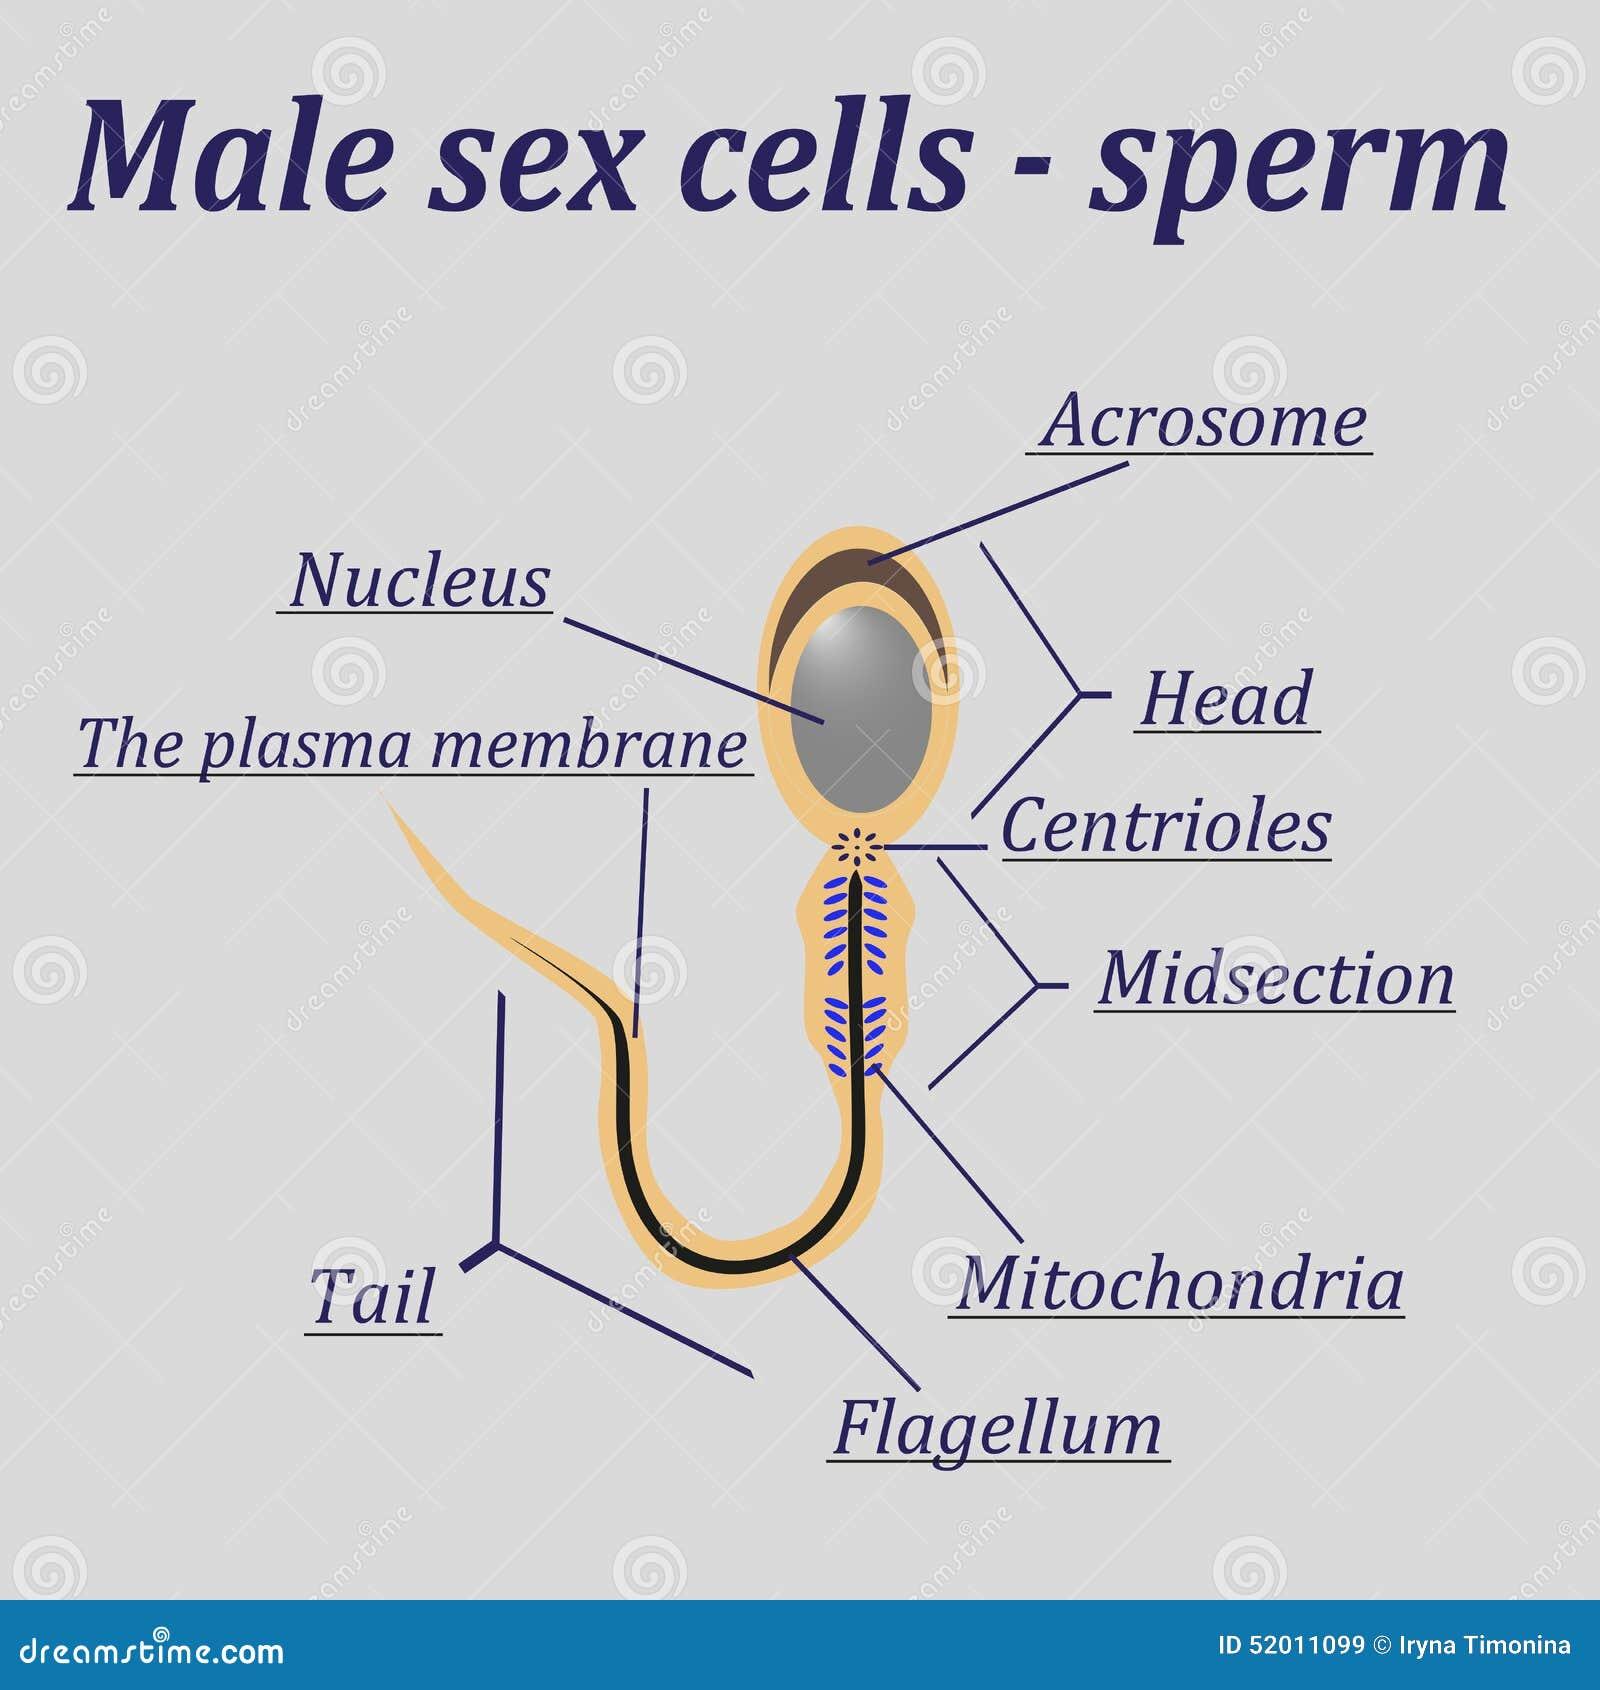 How a Man Produces 1,500 Sperm a Second